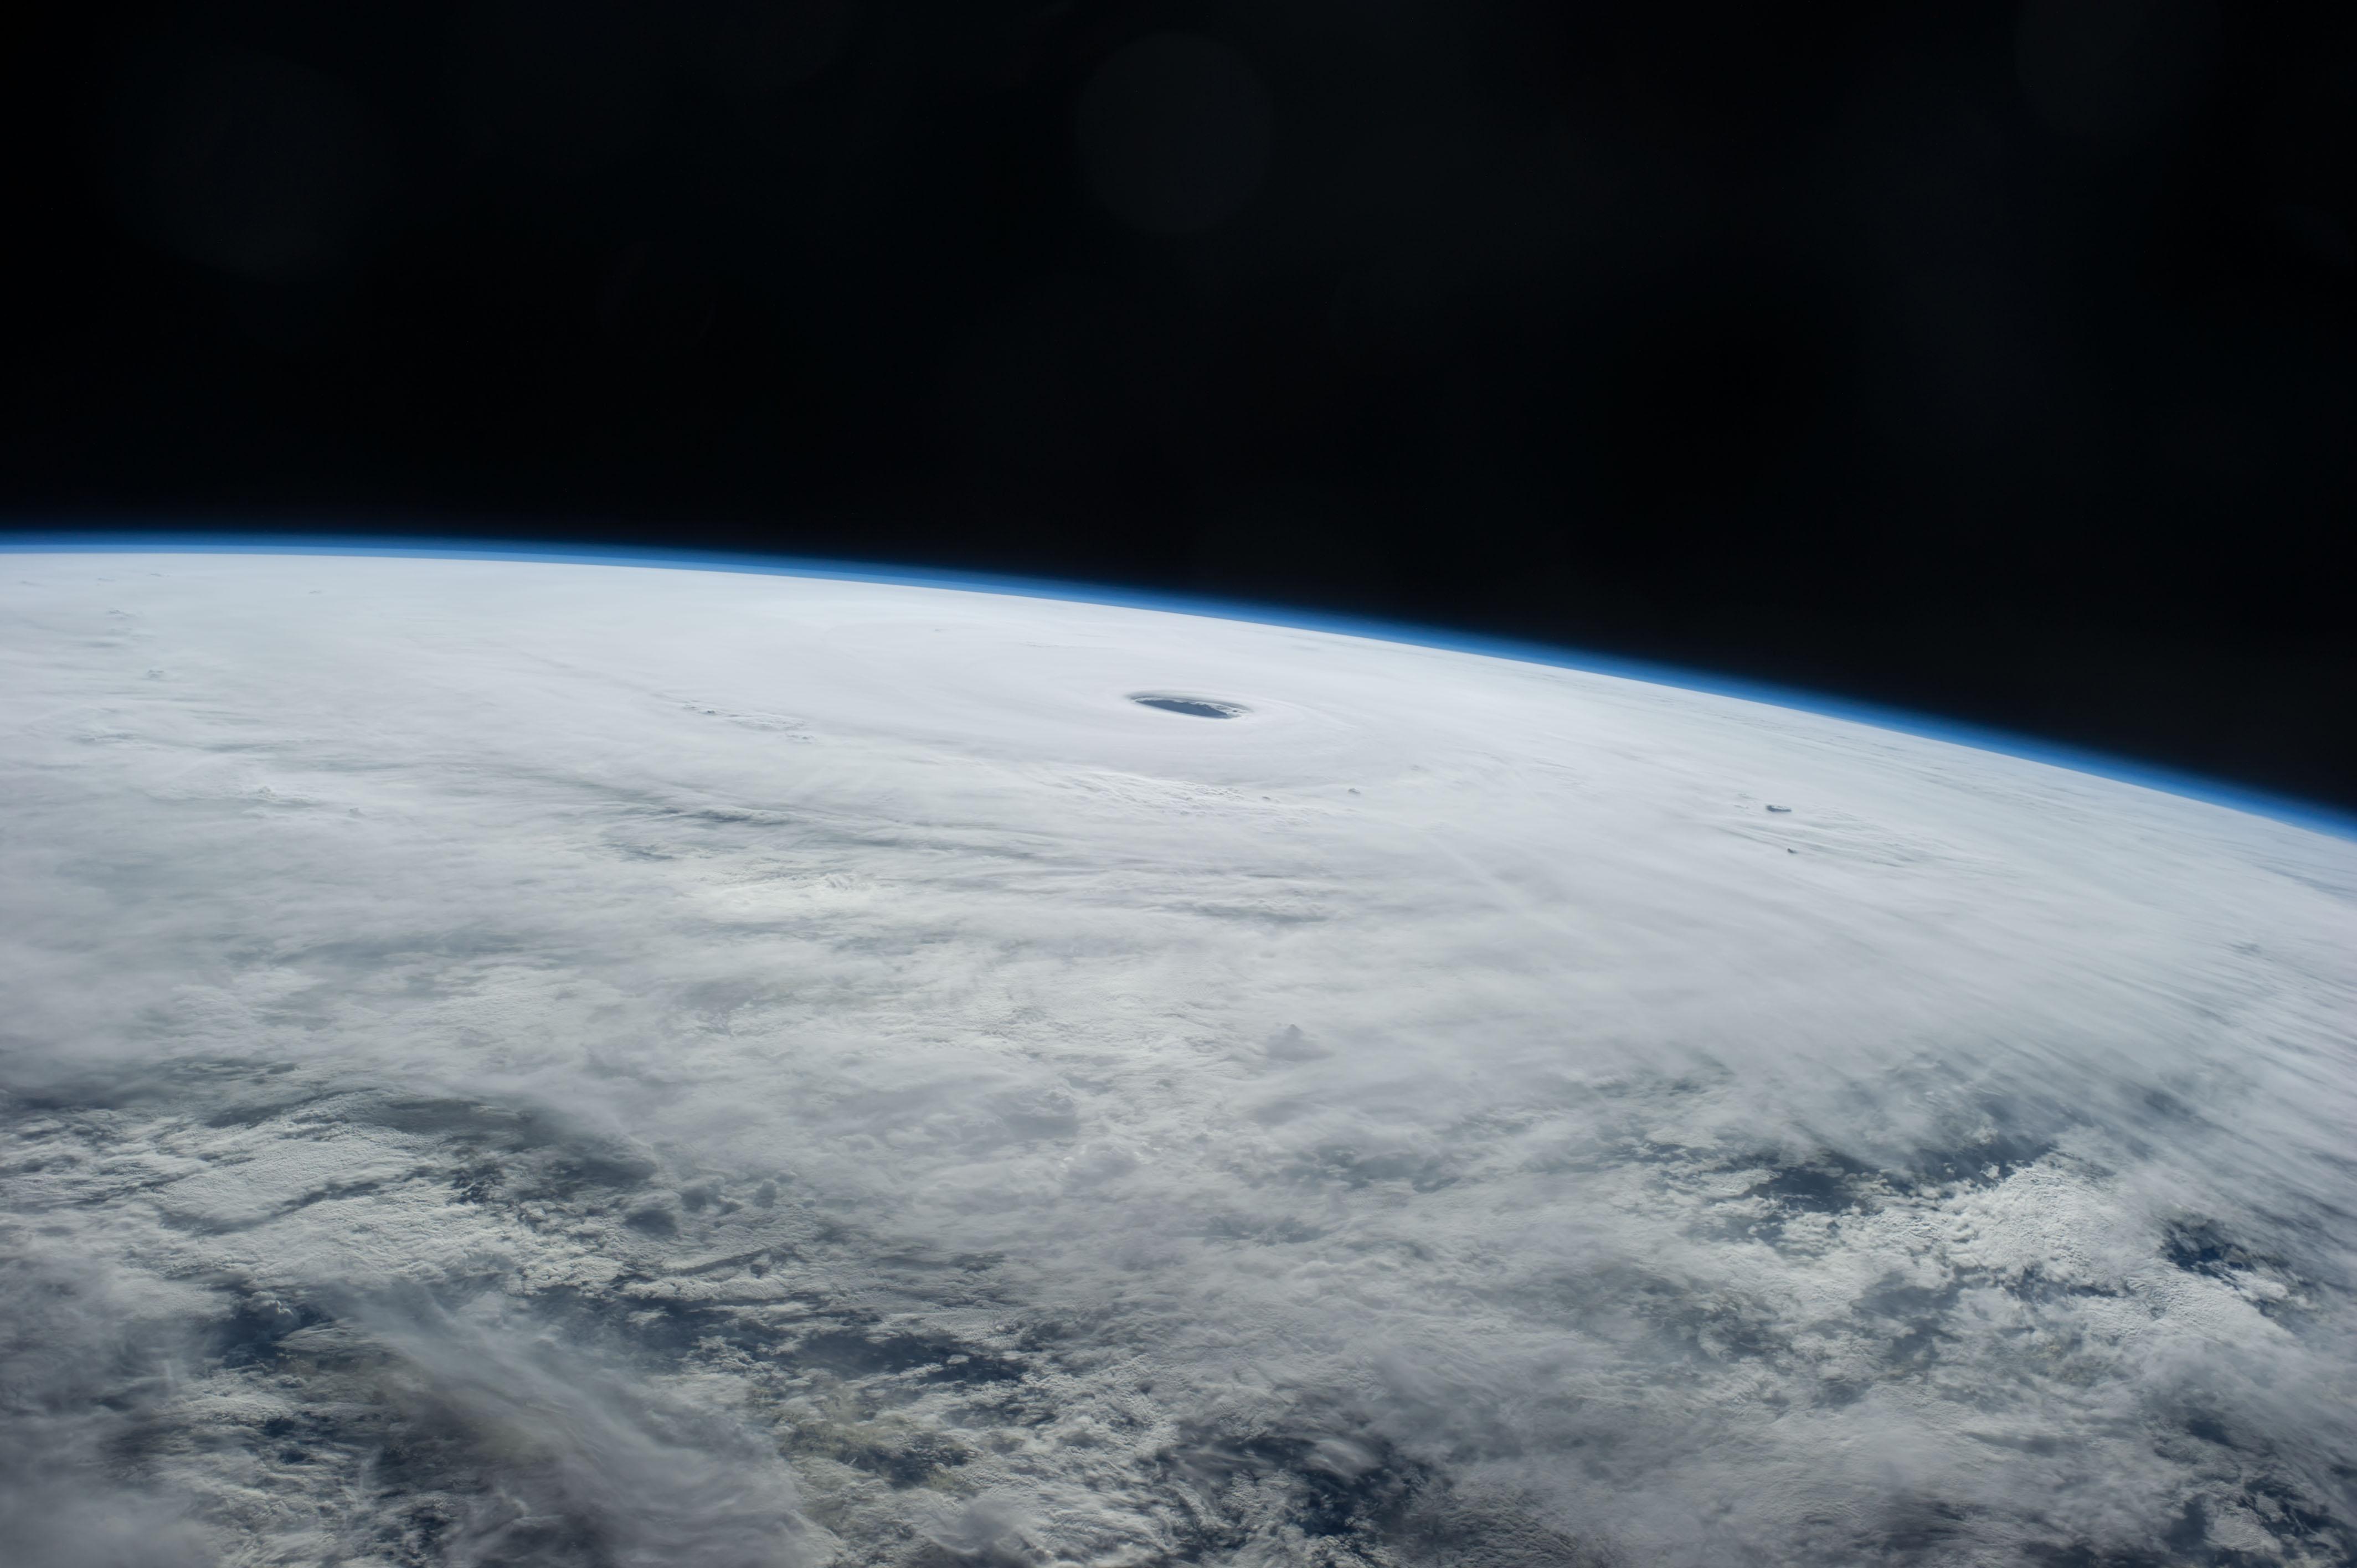 Vongfong (Western Pacific) | NASA